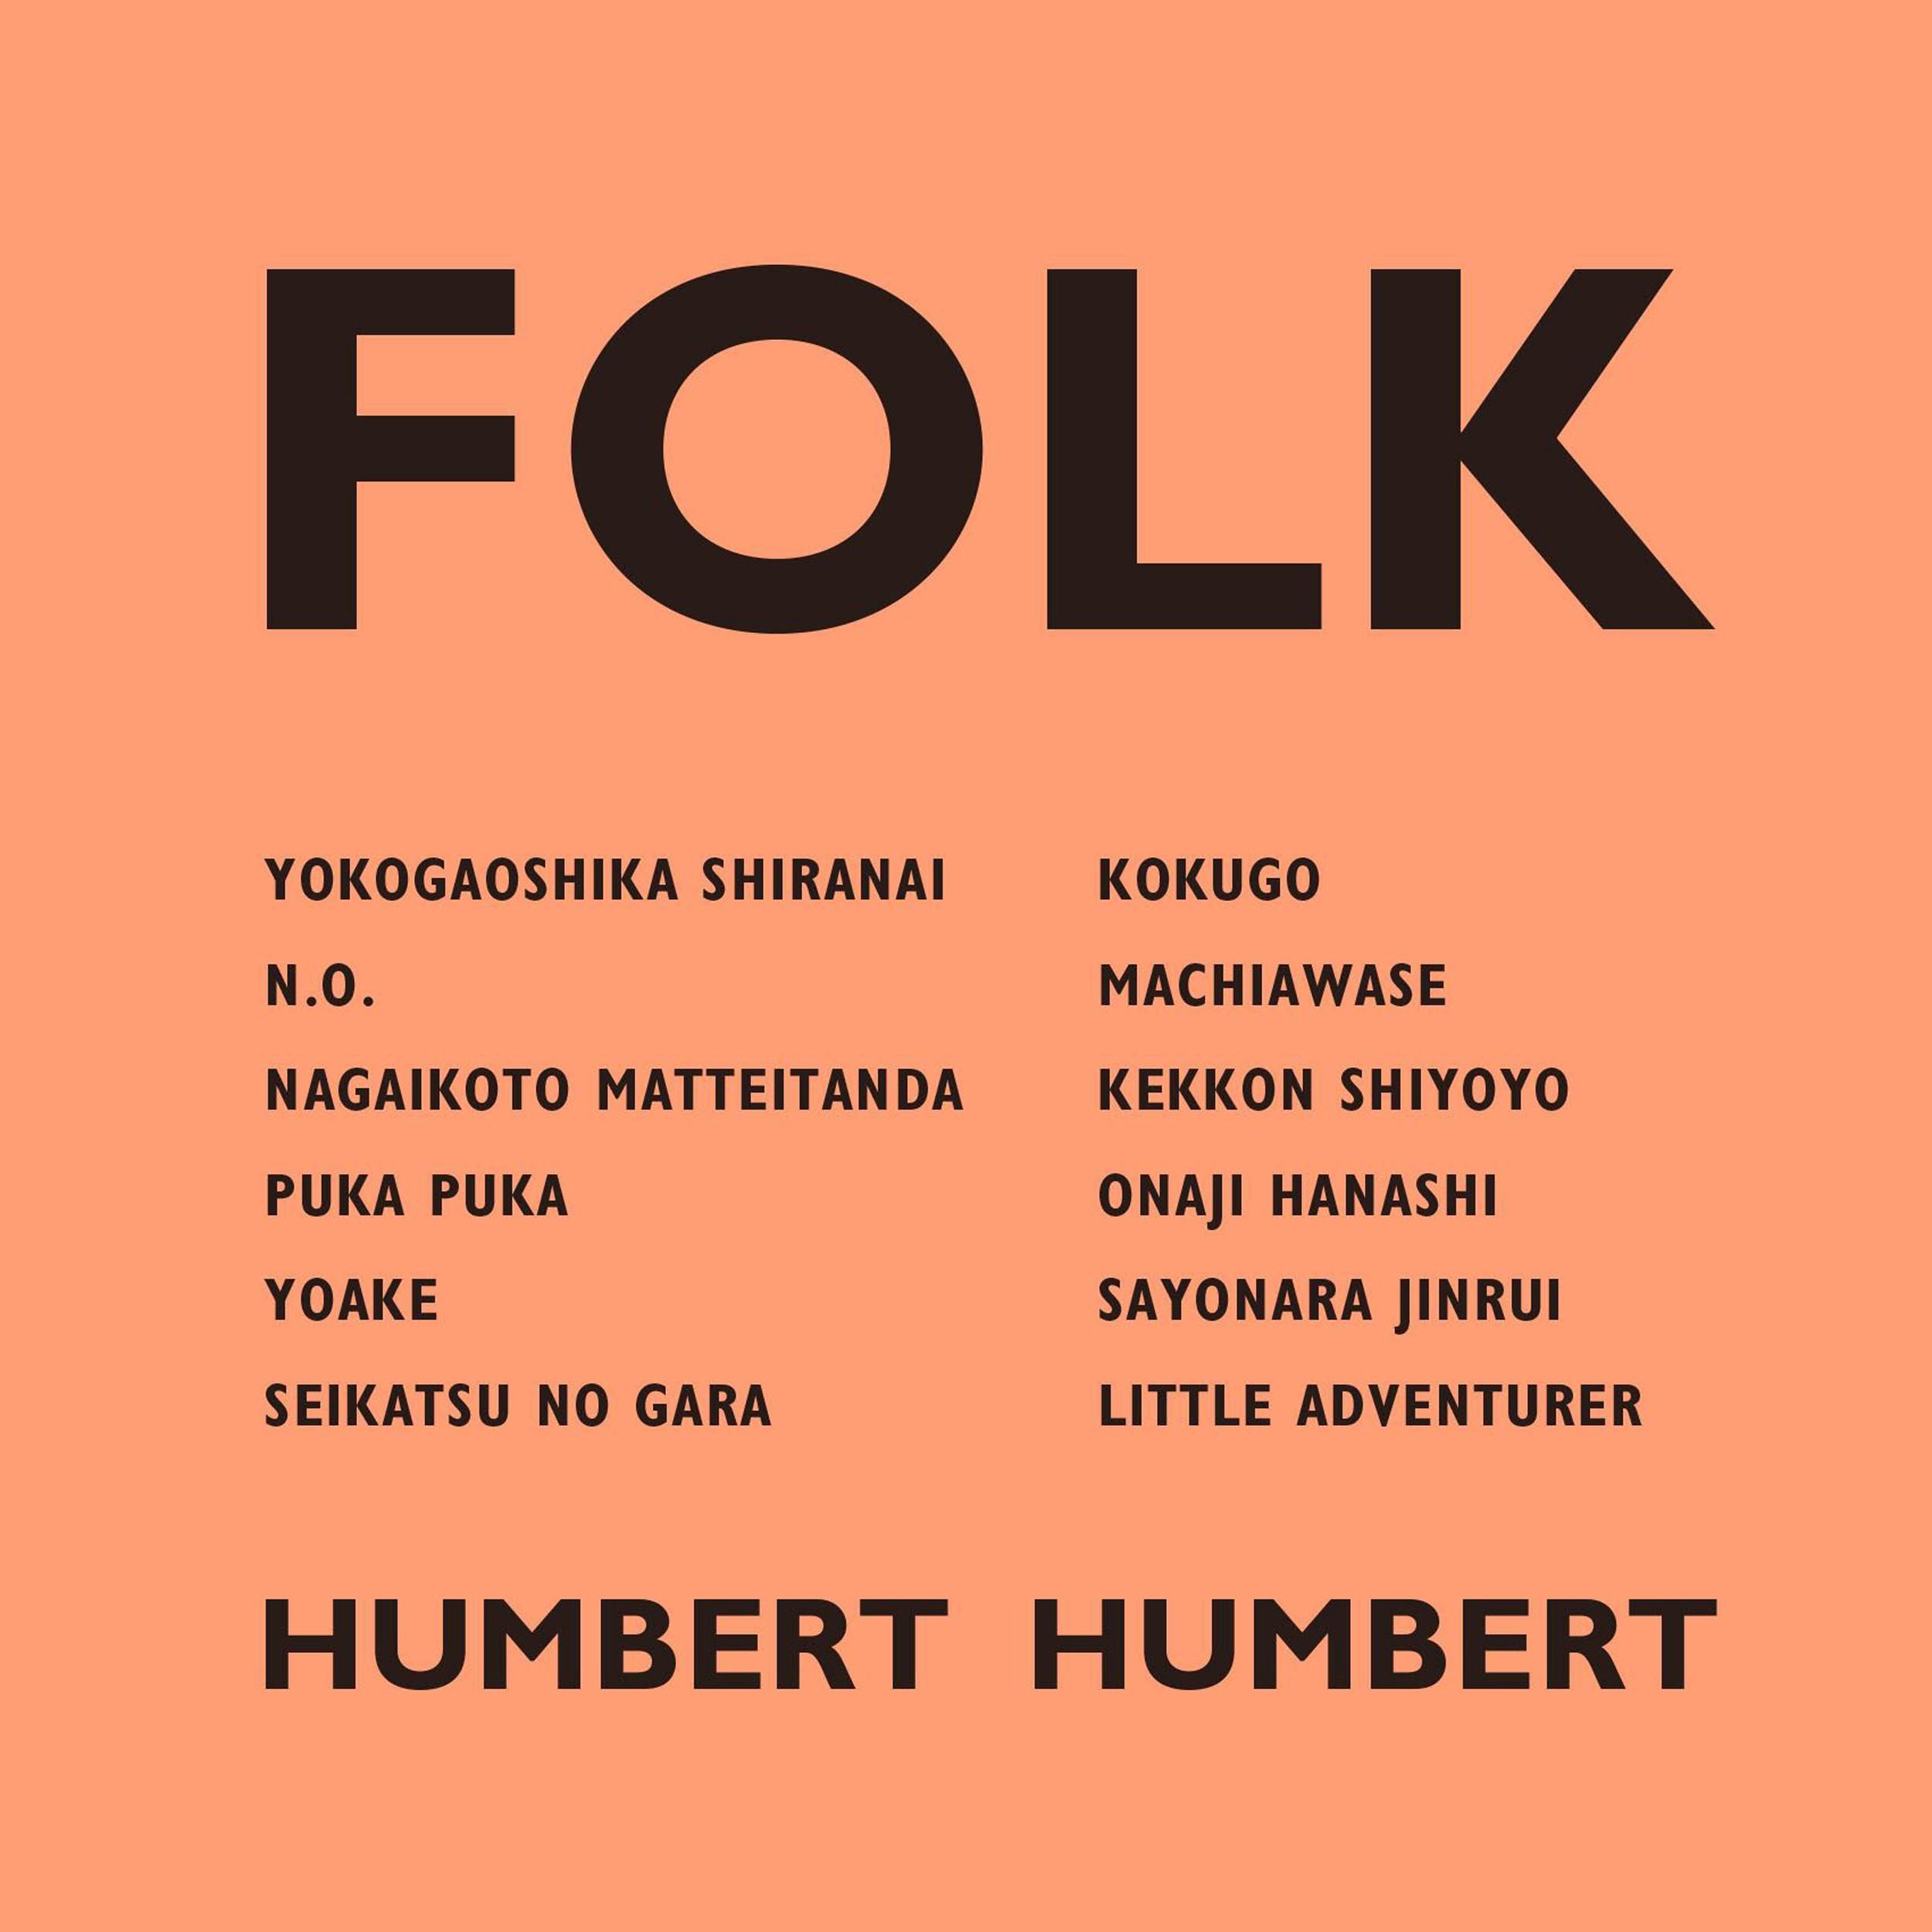 Image of FOLK / ハンバート ハンバート